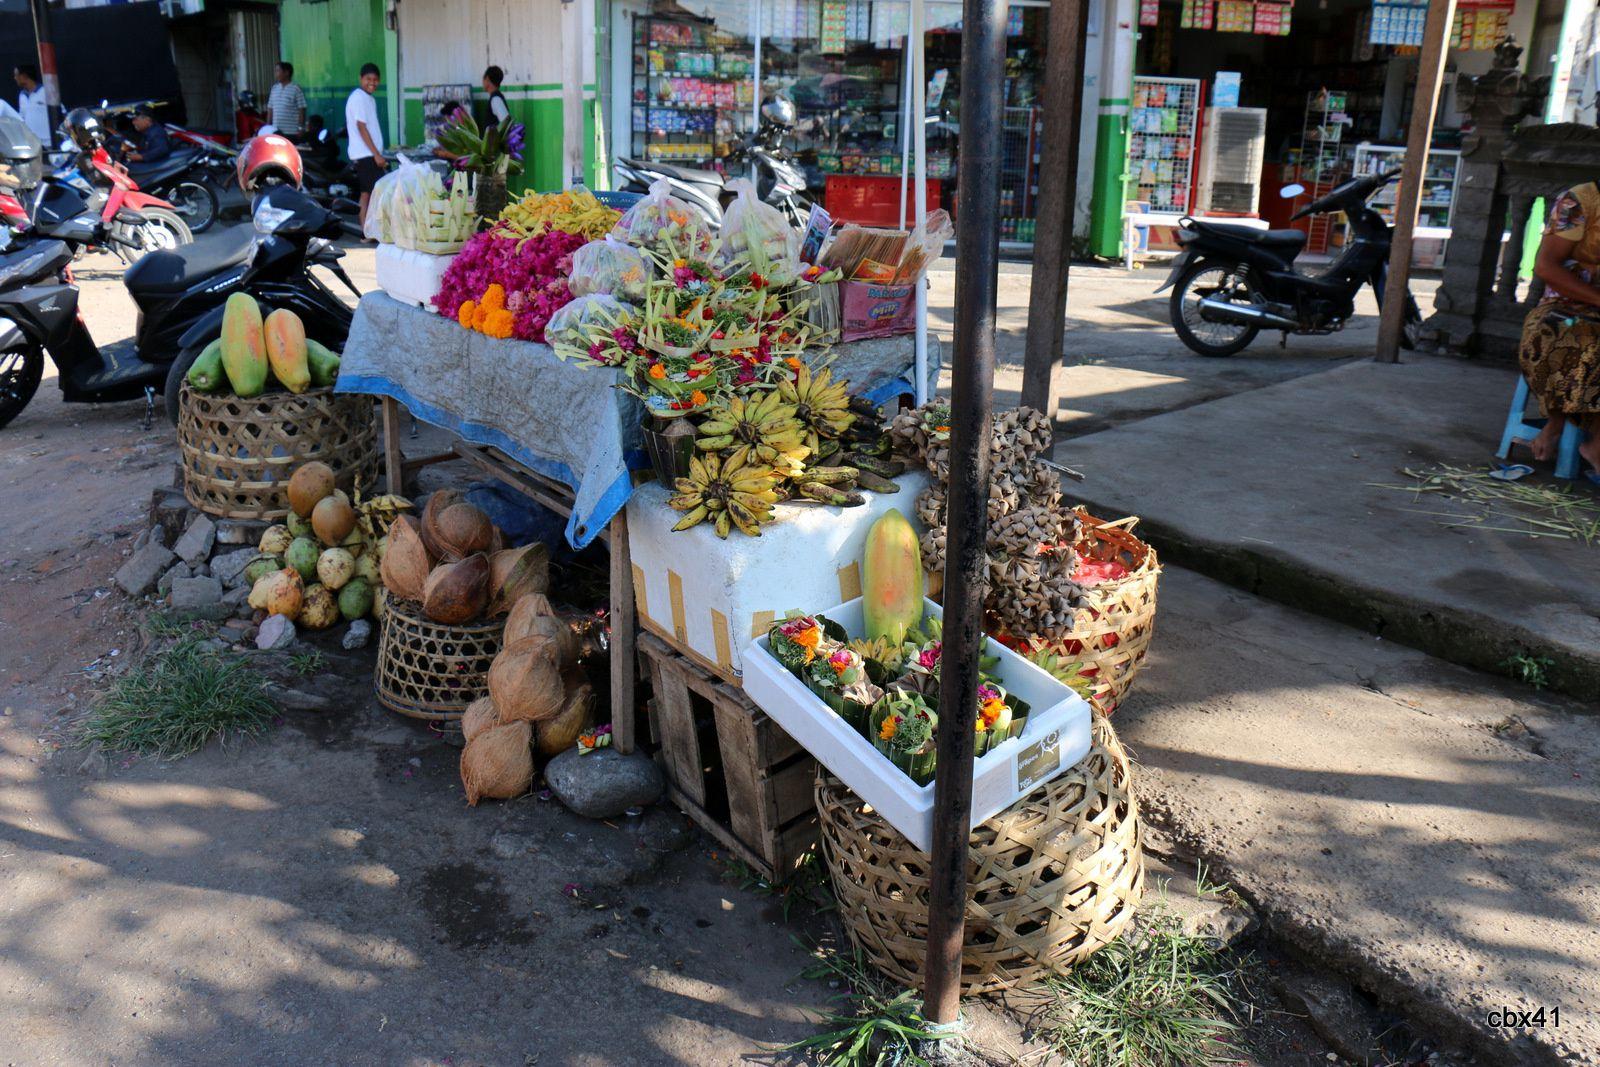 Banjar (Bali), commerces de bananes et de fleurs